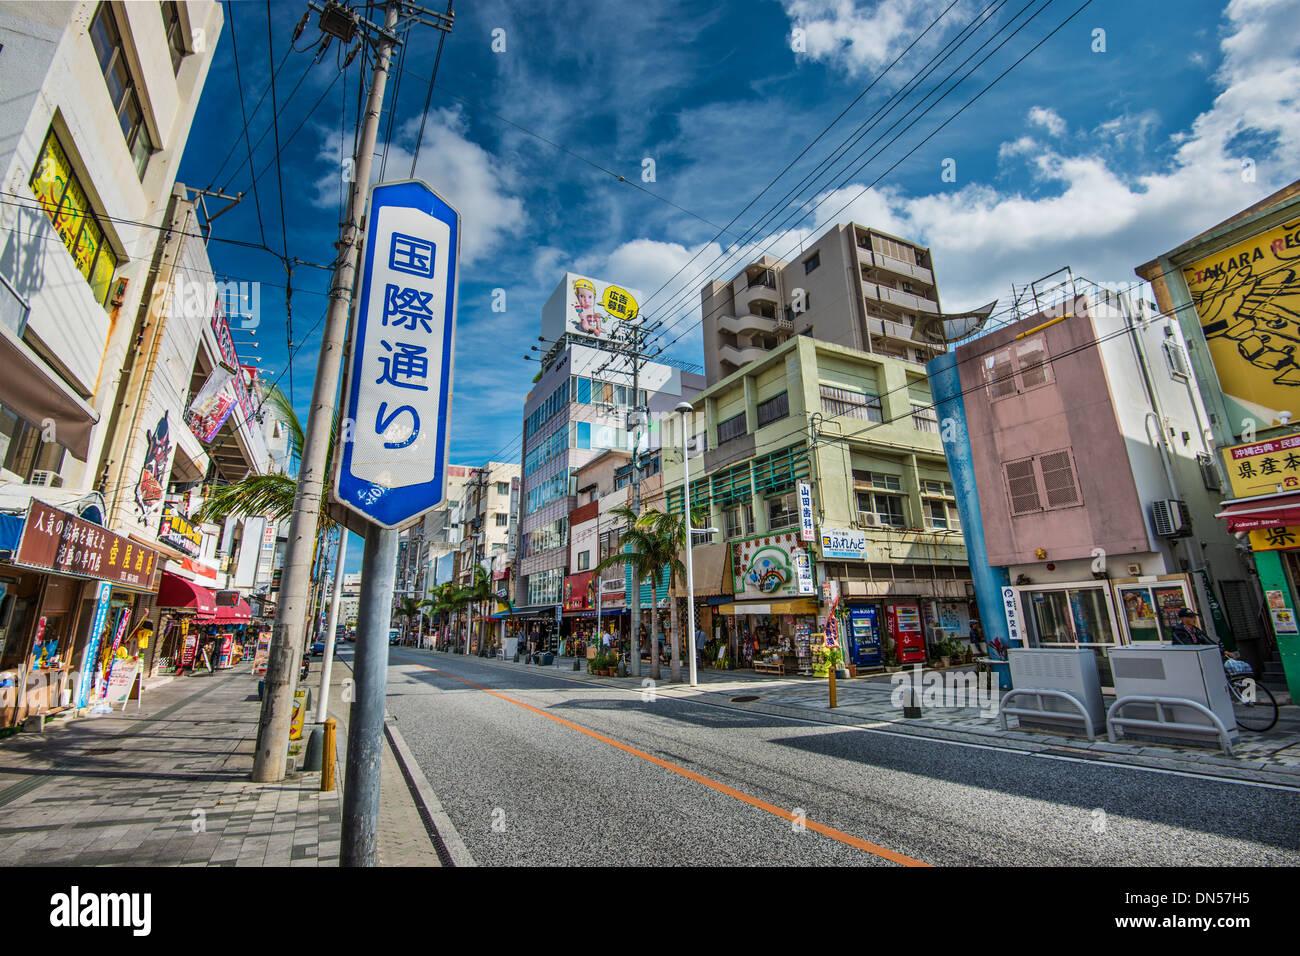 Naha, Japan at International Street. - Stock Image